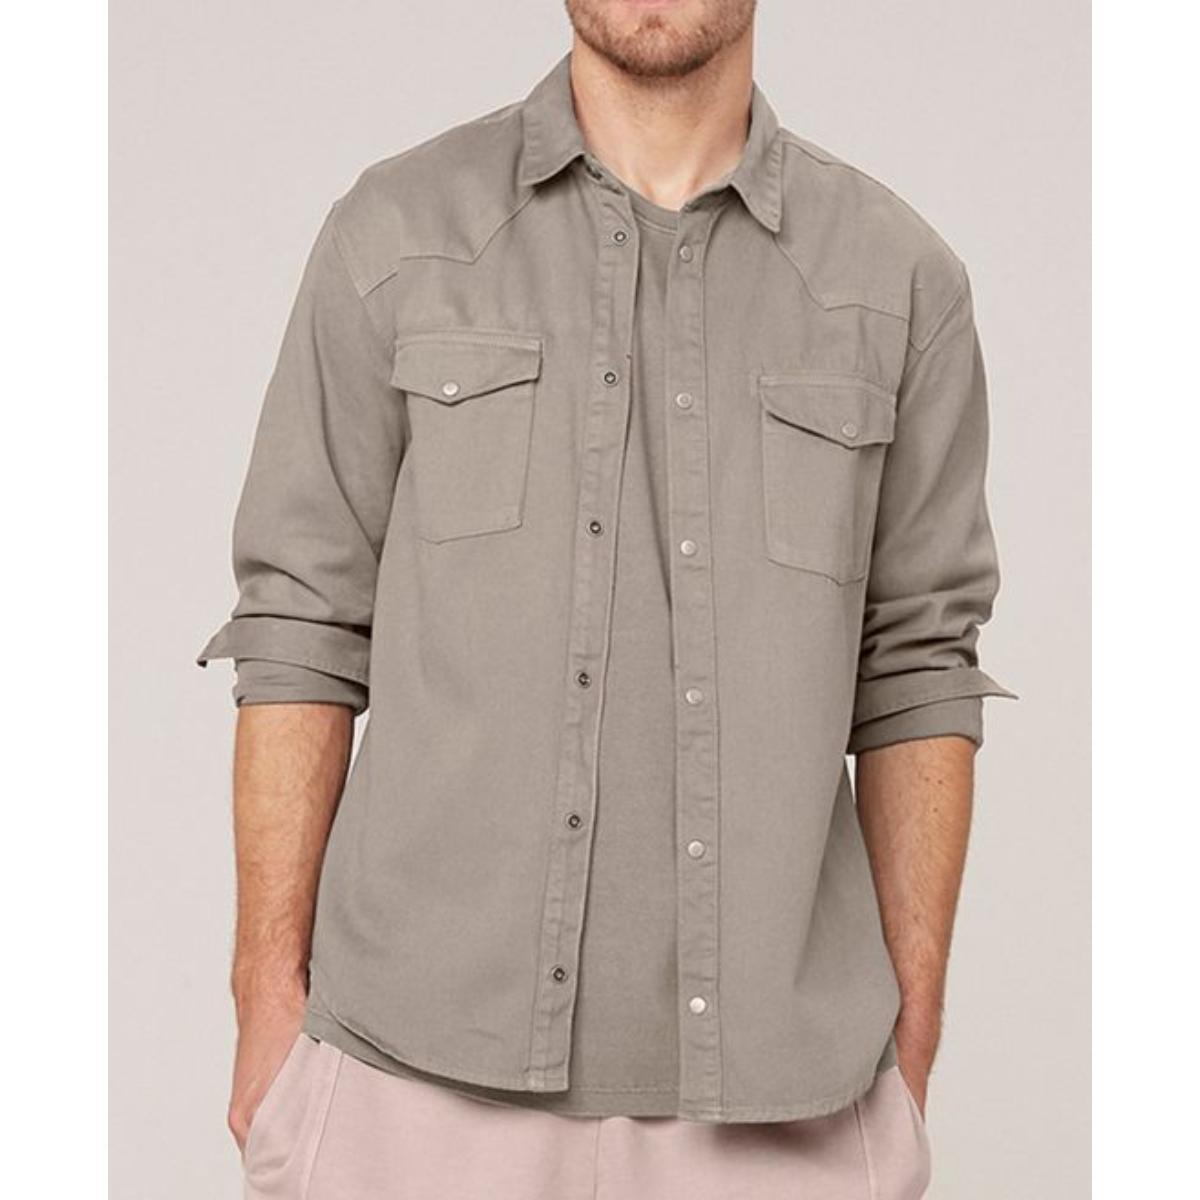 Camisa Masculina Dzarm Zil4 1asn Bege